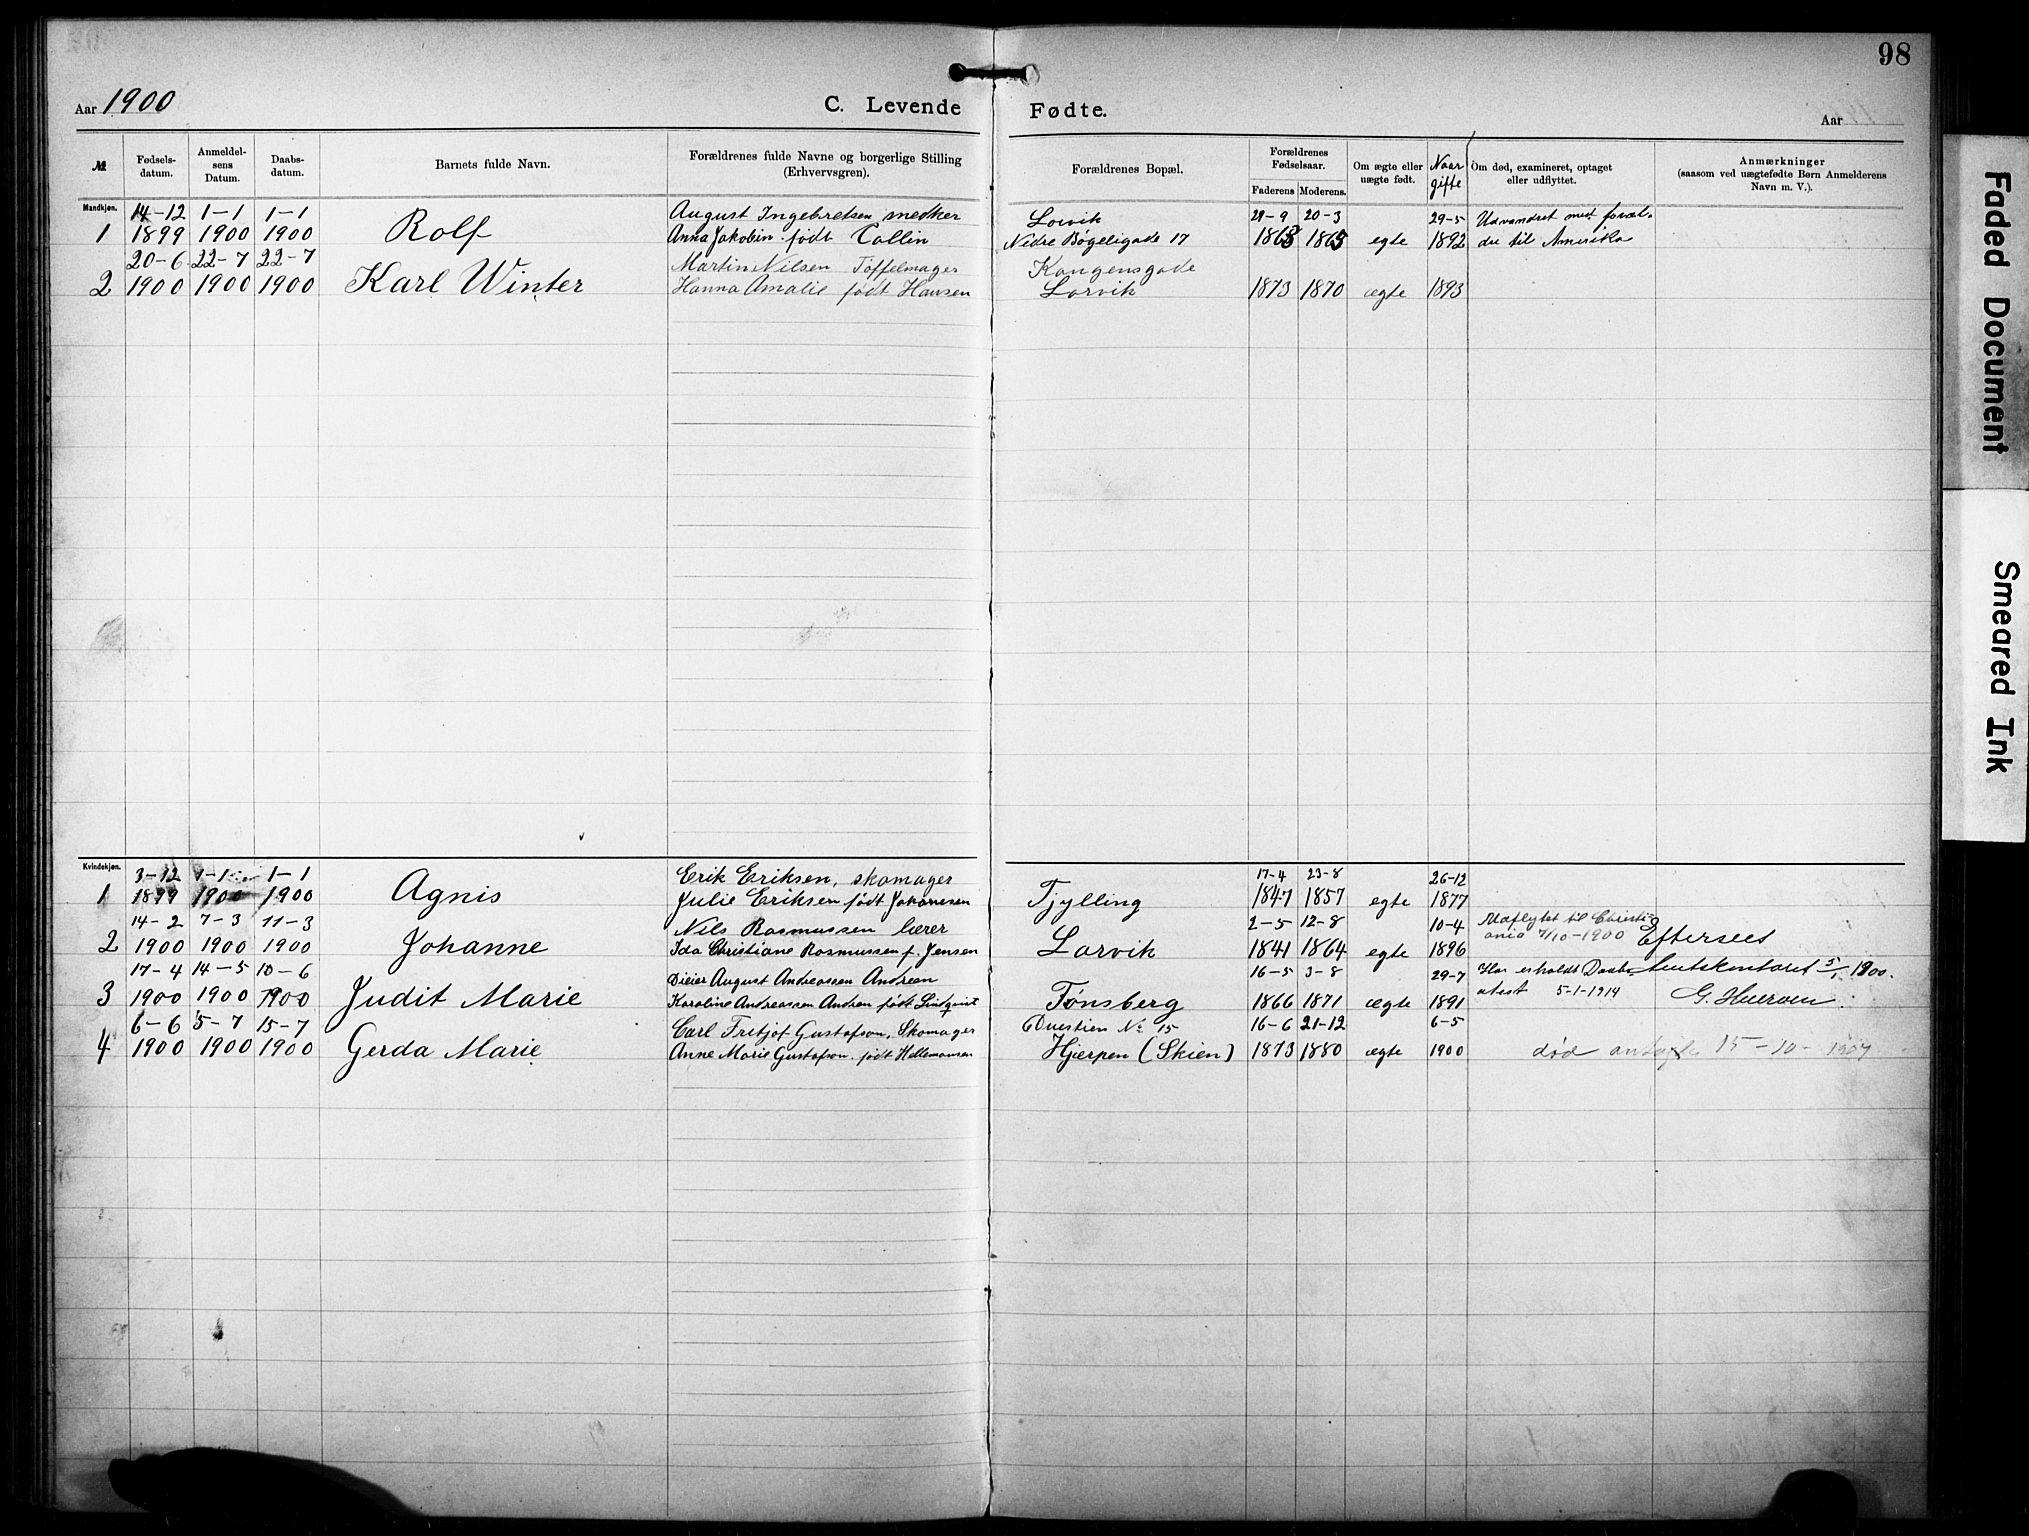 SAKO, Den katolsk-apostoliske menighet i Larvik, F/Fa/L0001: Dissenter register no. 1, 1892-1933, p. 98